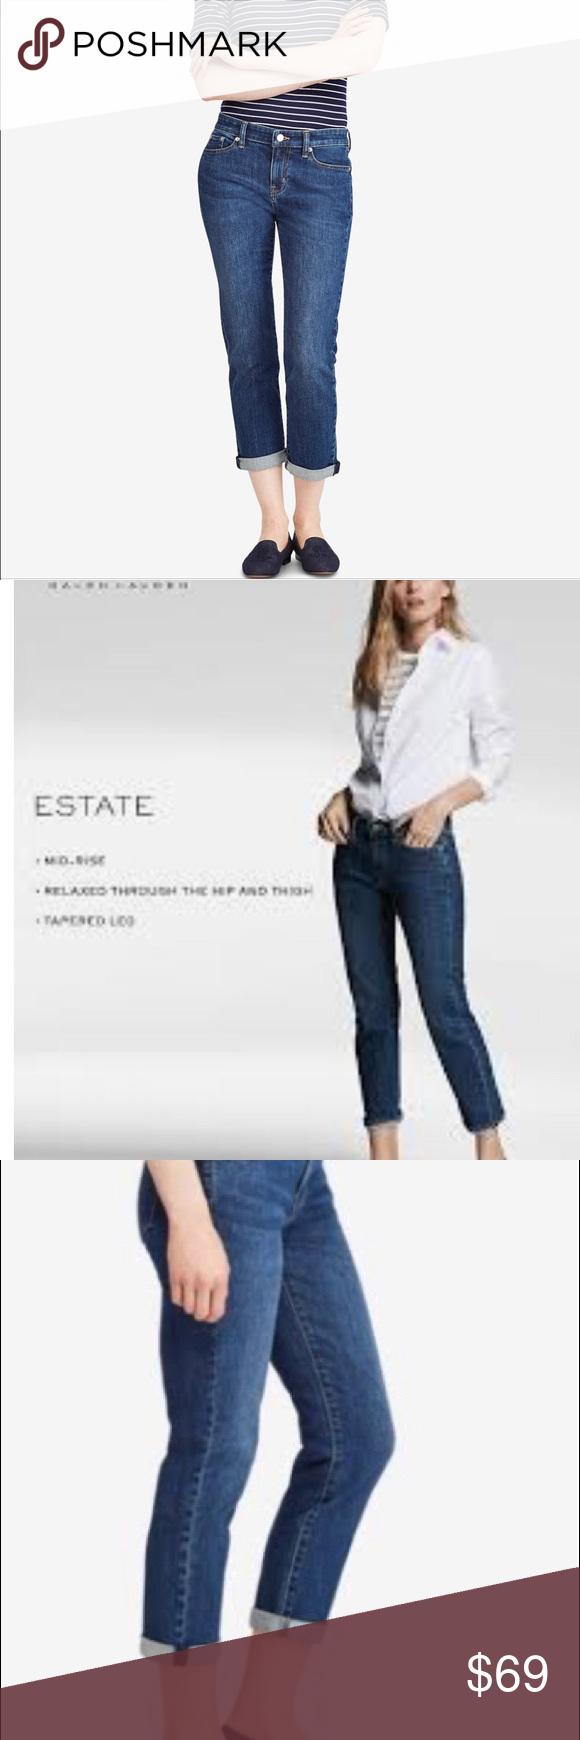 a6c4a93900 🍎25% off🍎Ralph Lauren premiere Estate crop Jean • All sizes ...